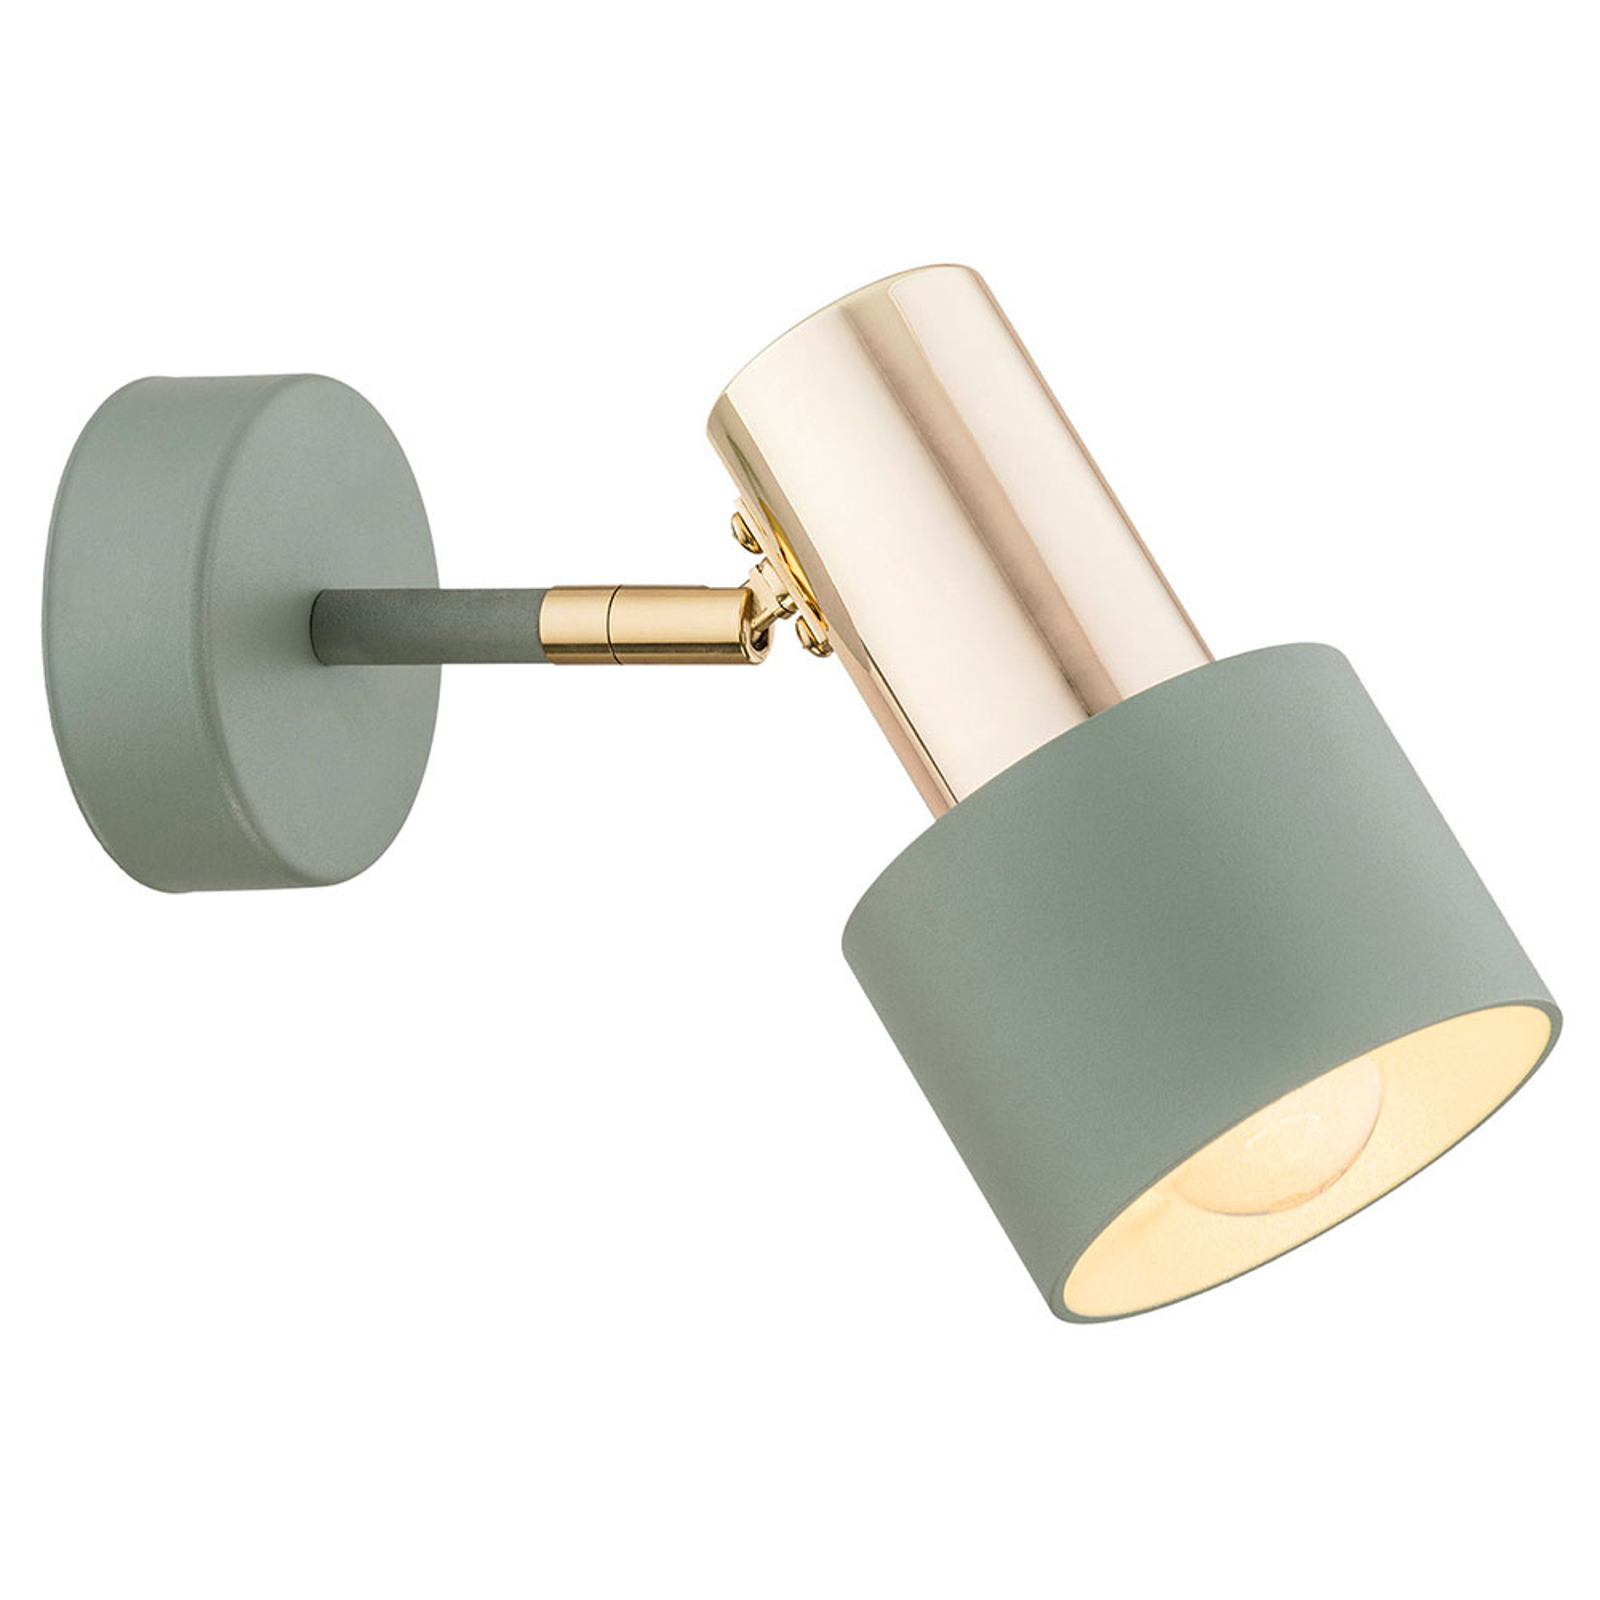 Destin vægspot, 1 lyskilde, grøn/messing